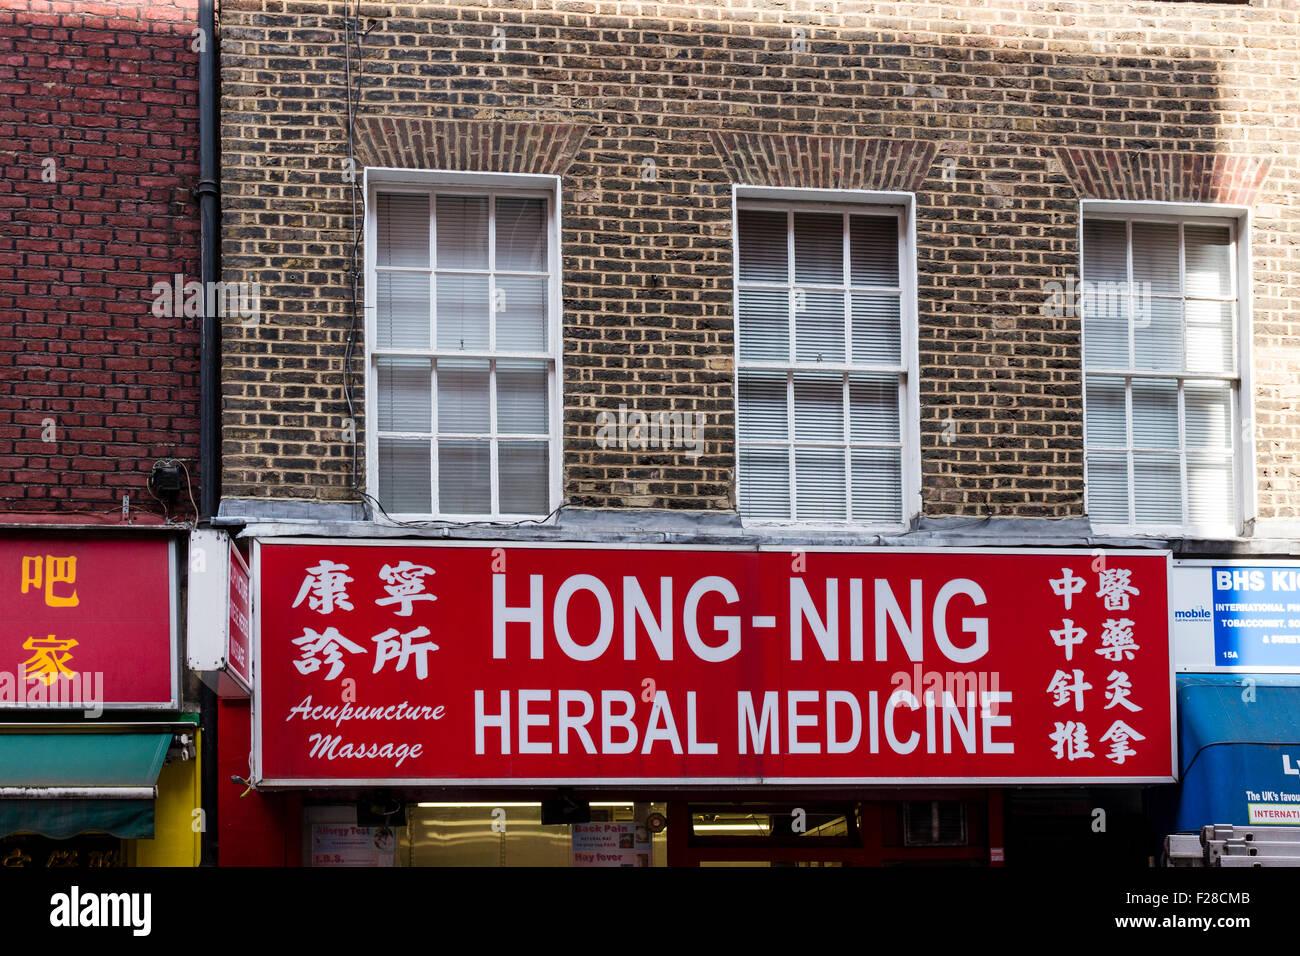 Hong-Ning Herbal Medicine Store, China Town London - Stock Image